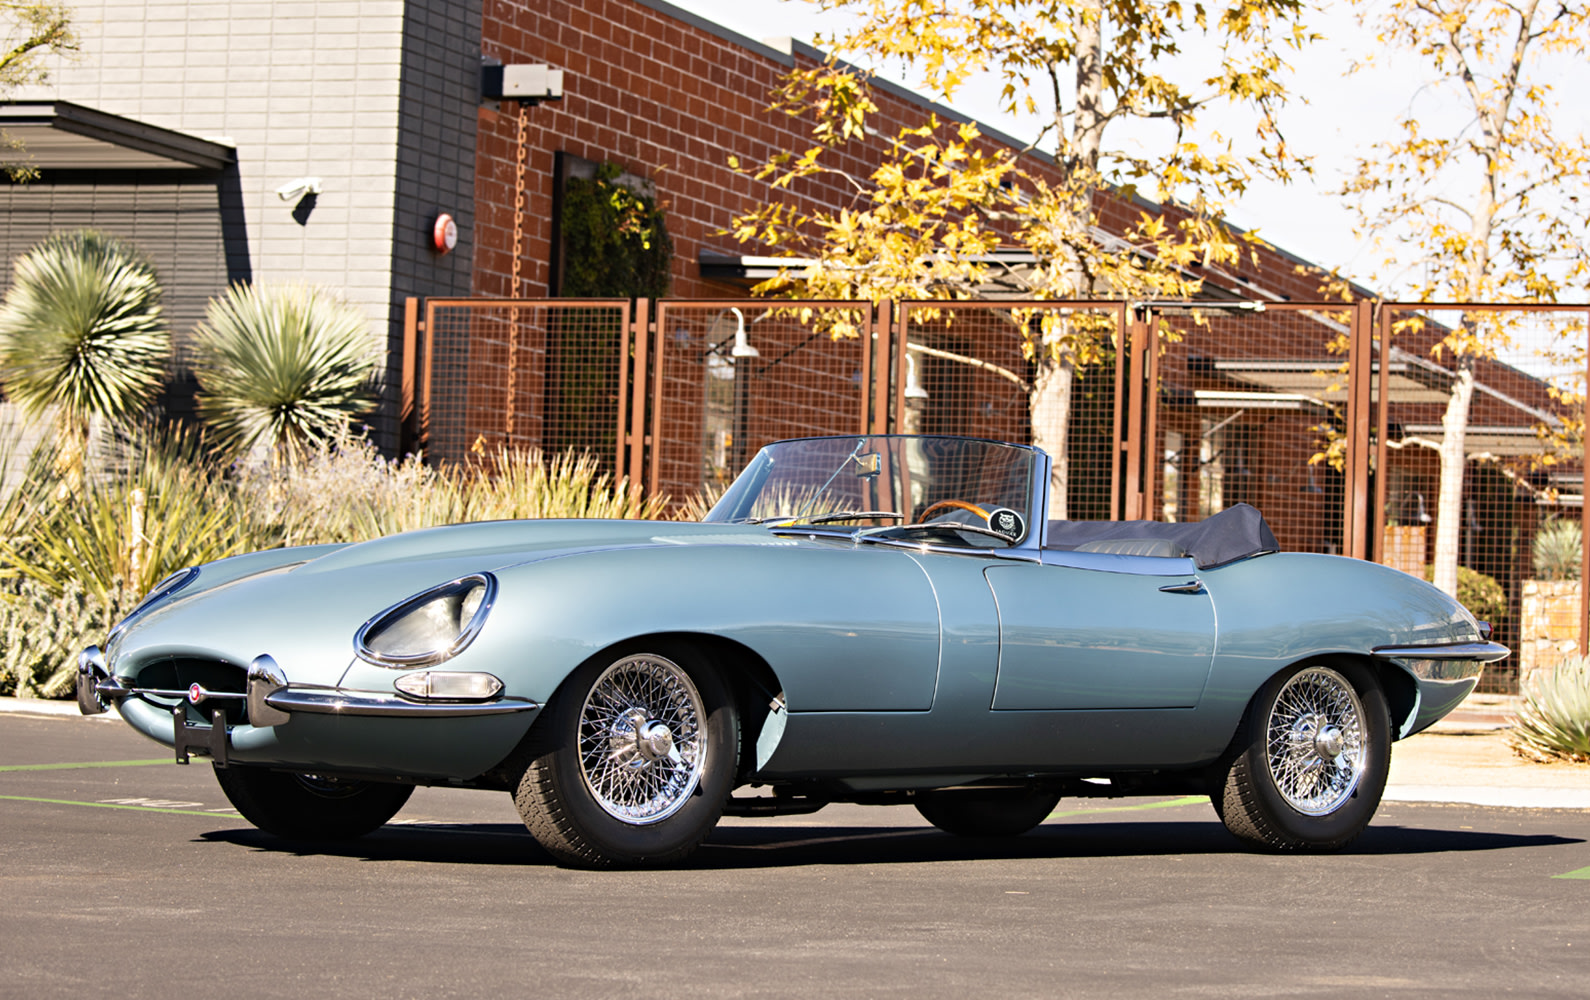 1966 Jaguar E-Type Series I 4.2-Litre Roadster (1)